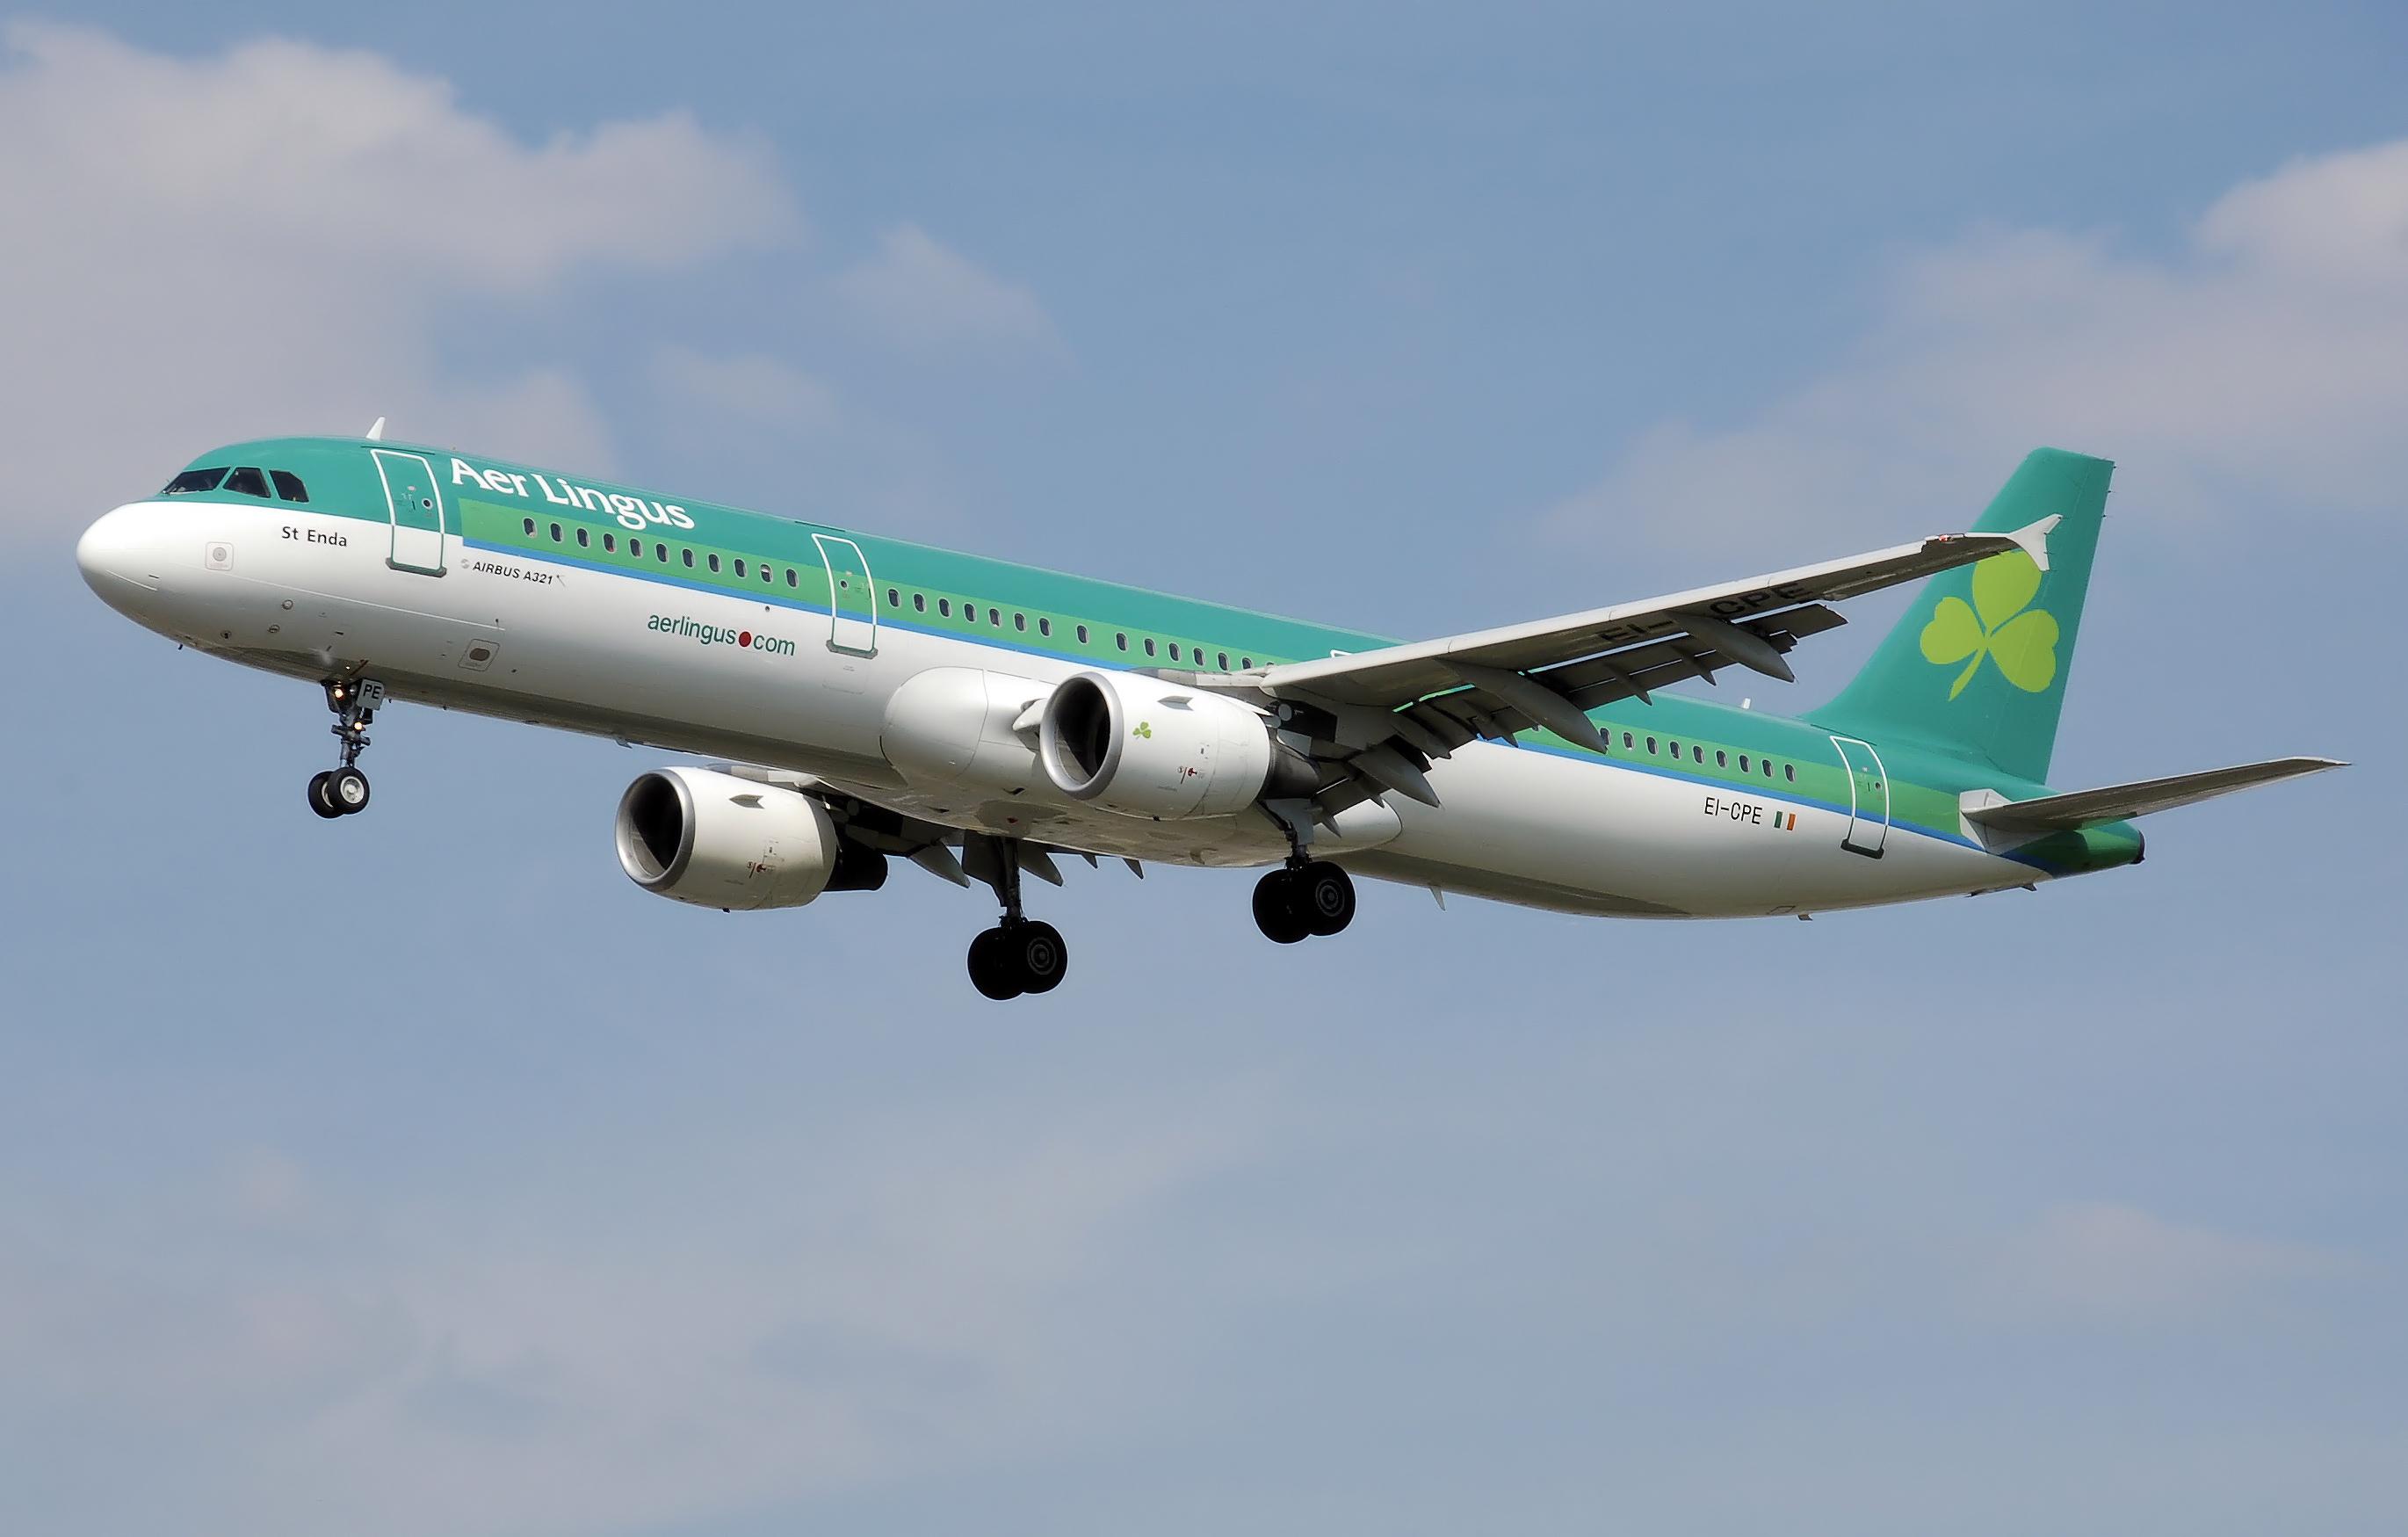 Vuelos baratos desde Londres Heathrow a Dublín - Aer Lingus